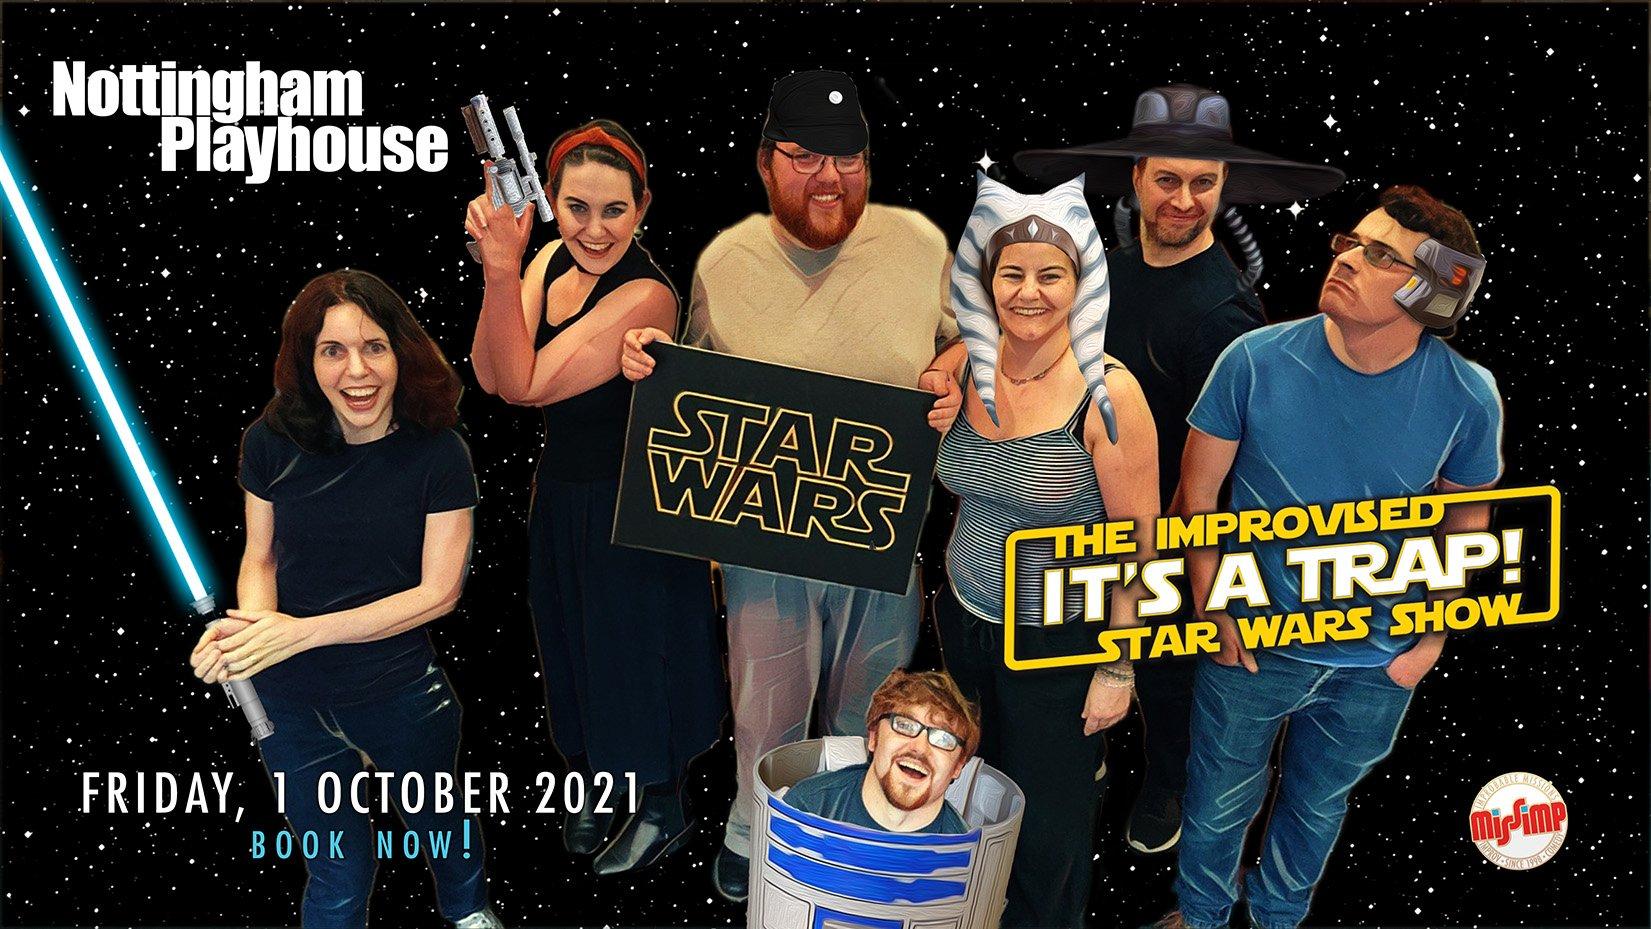 Star Wars cast rehearsal